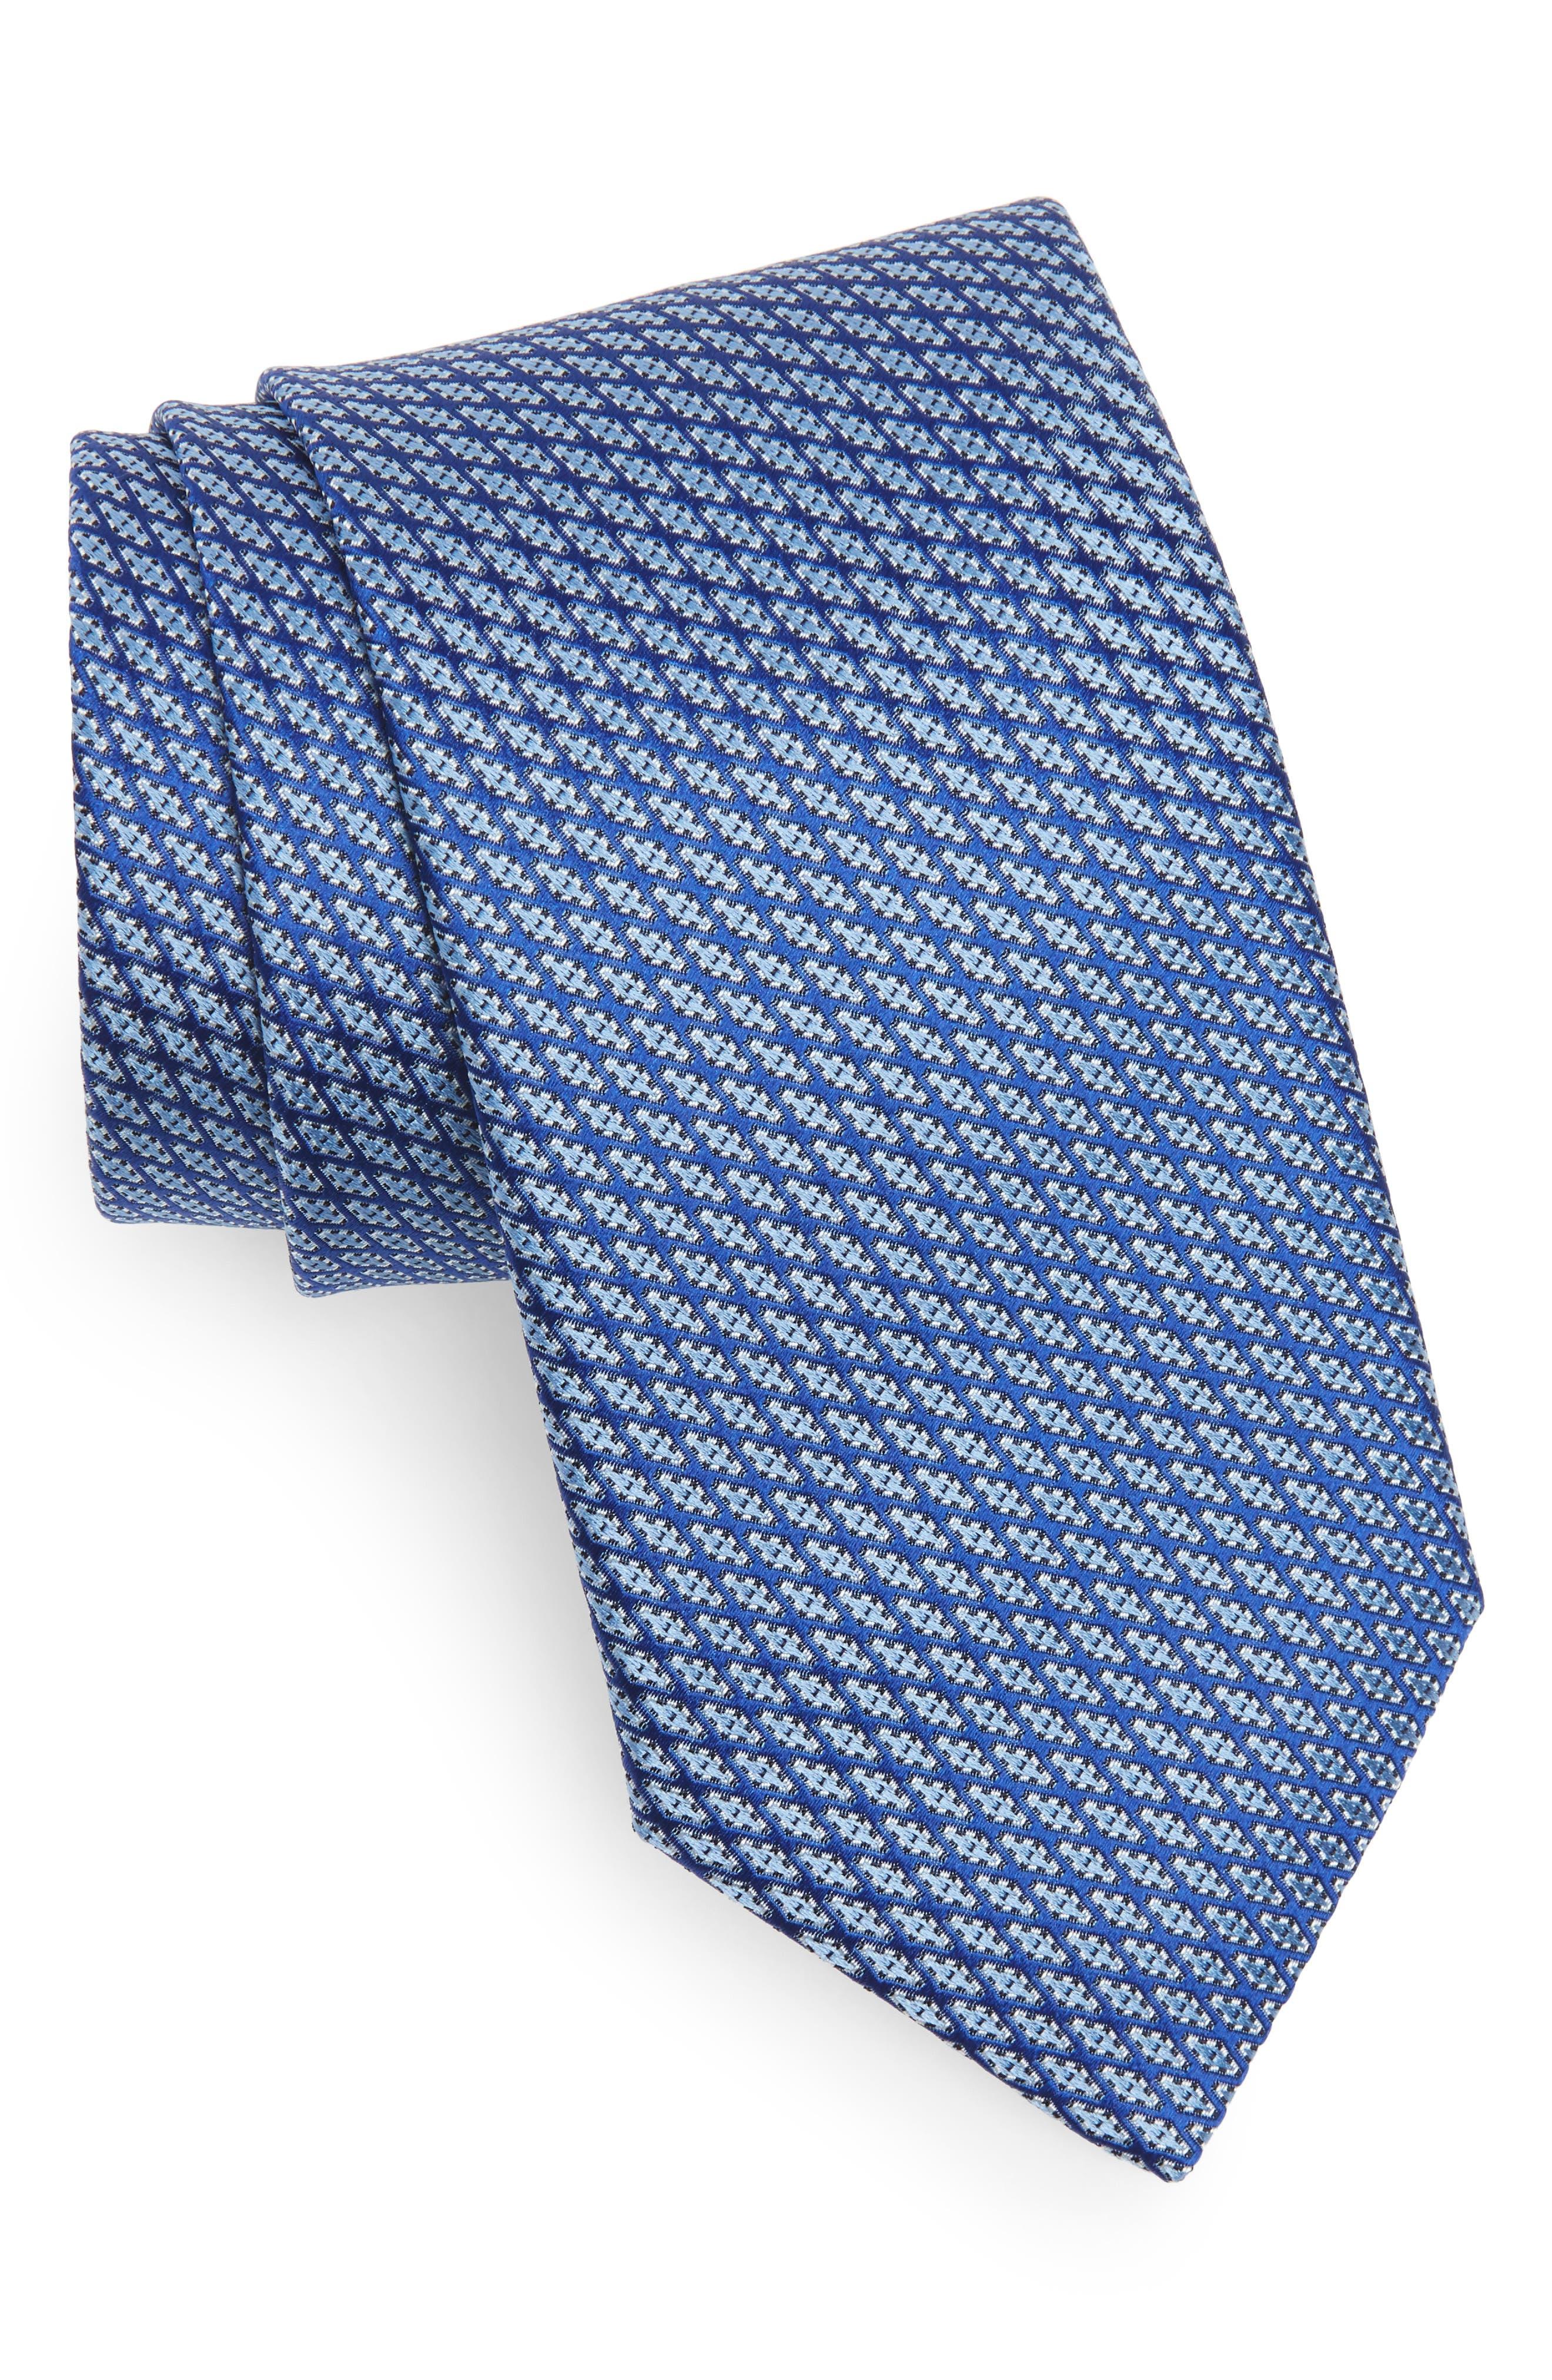 Main Image - Canali Neat Silk Tie